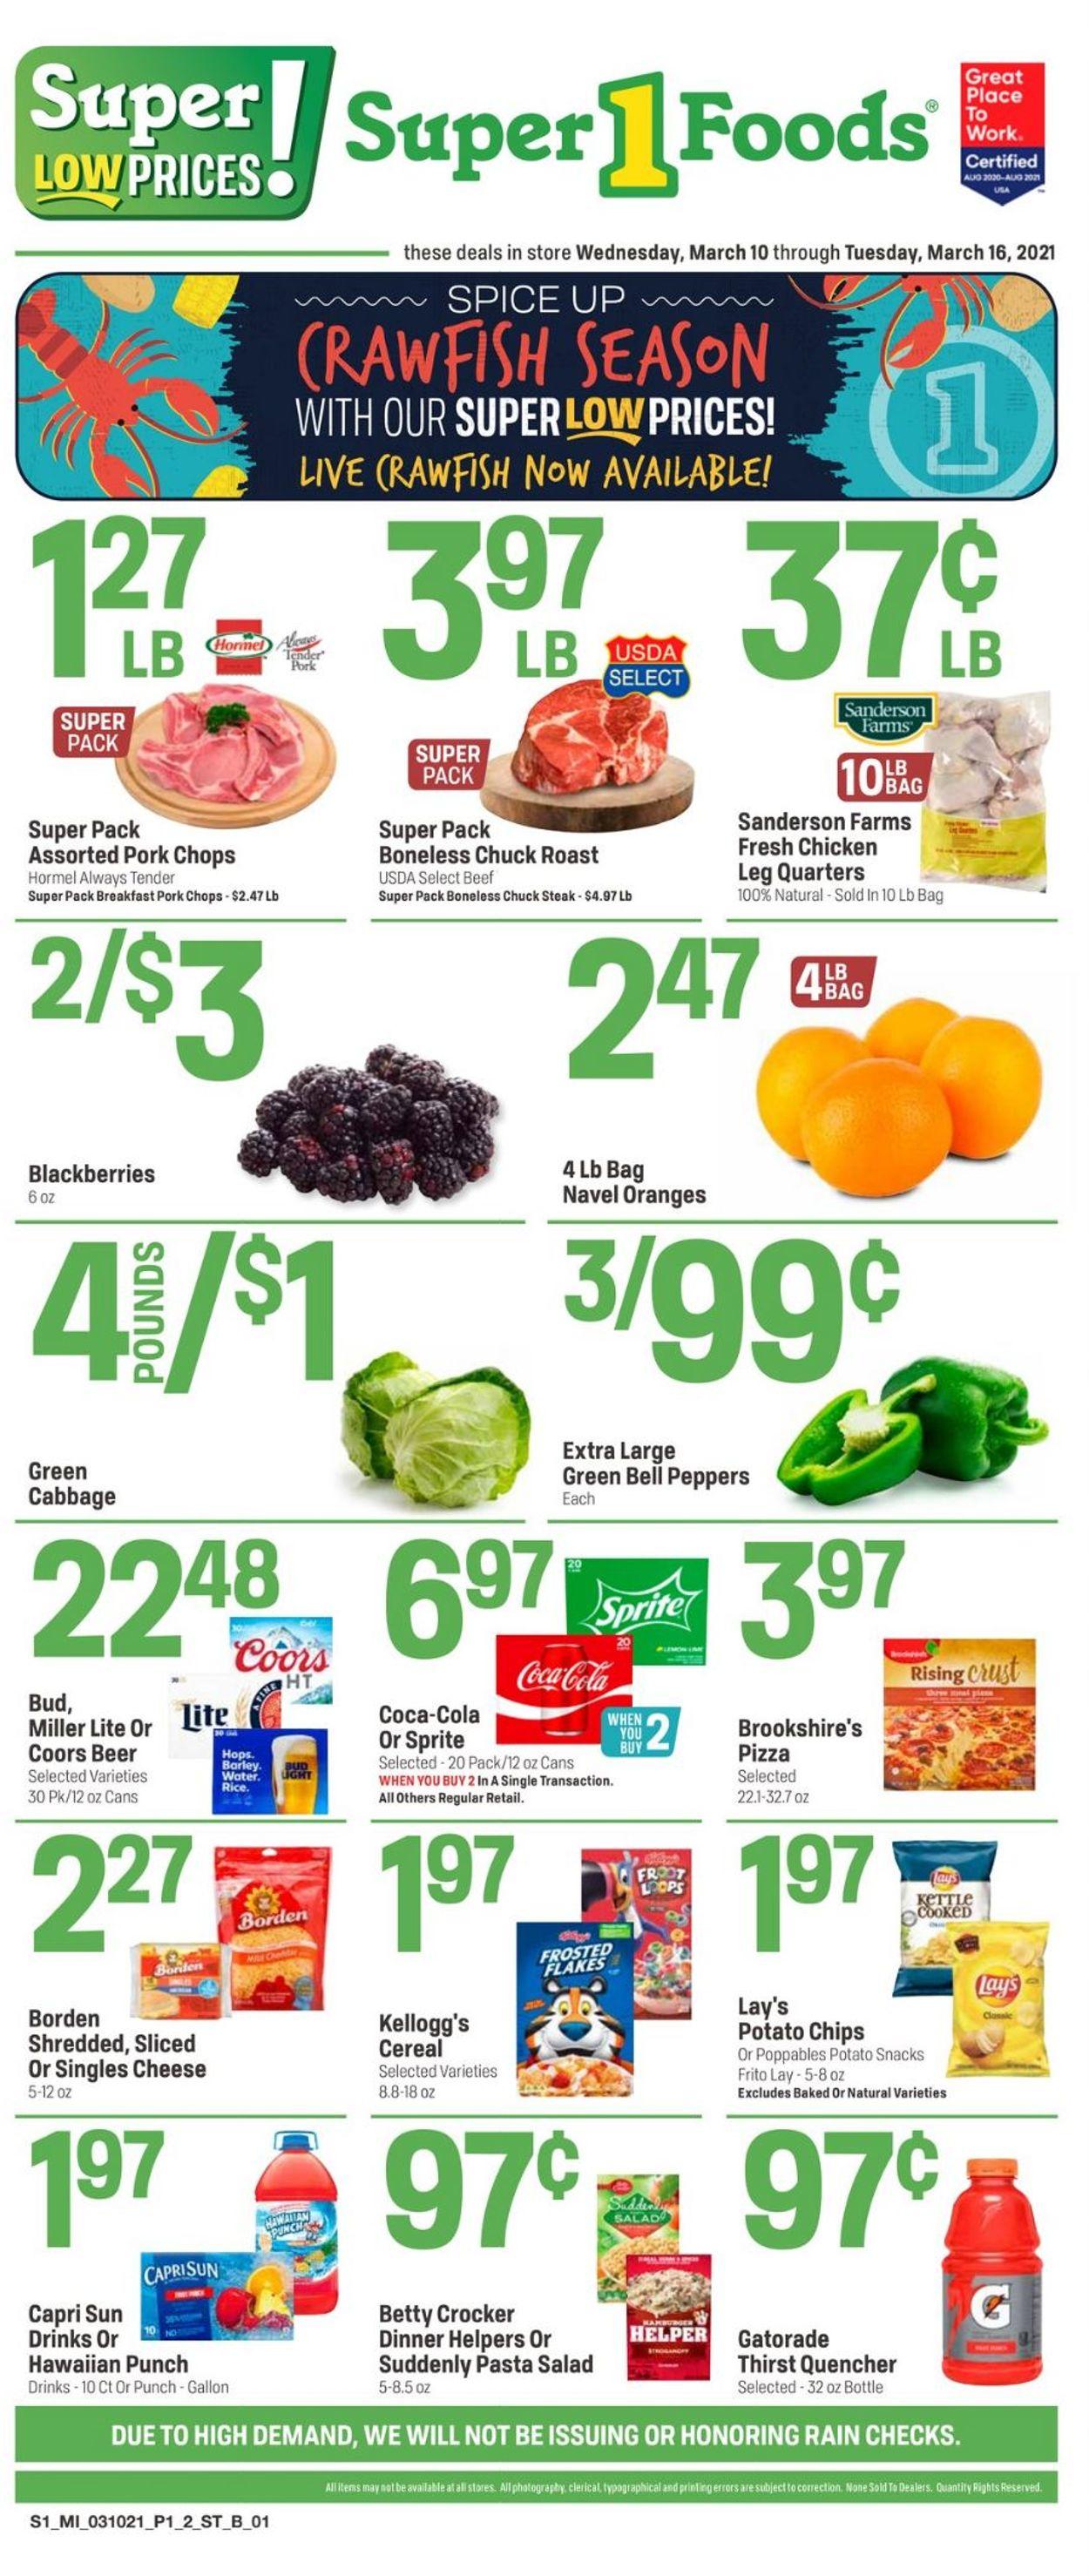 Super 1 Foods Weekly Ad Circular - valid 03/10-03/16/2021